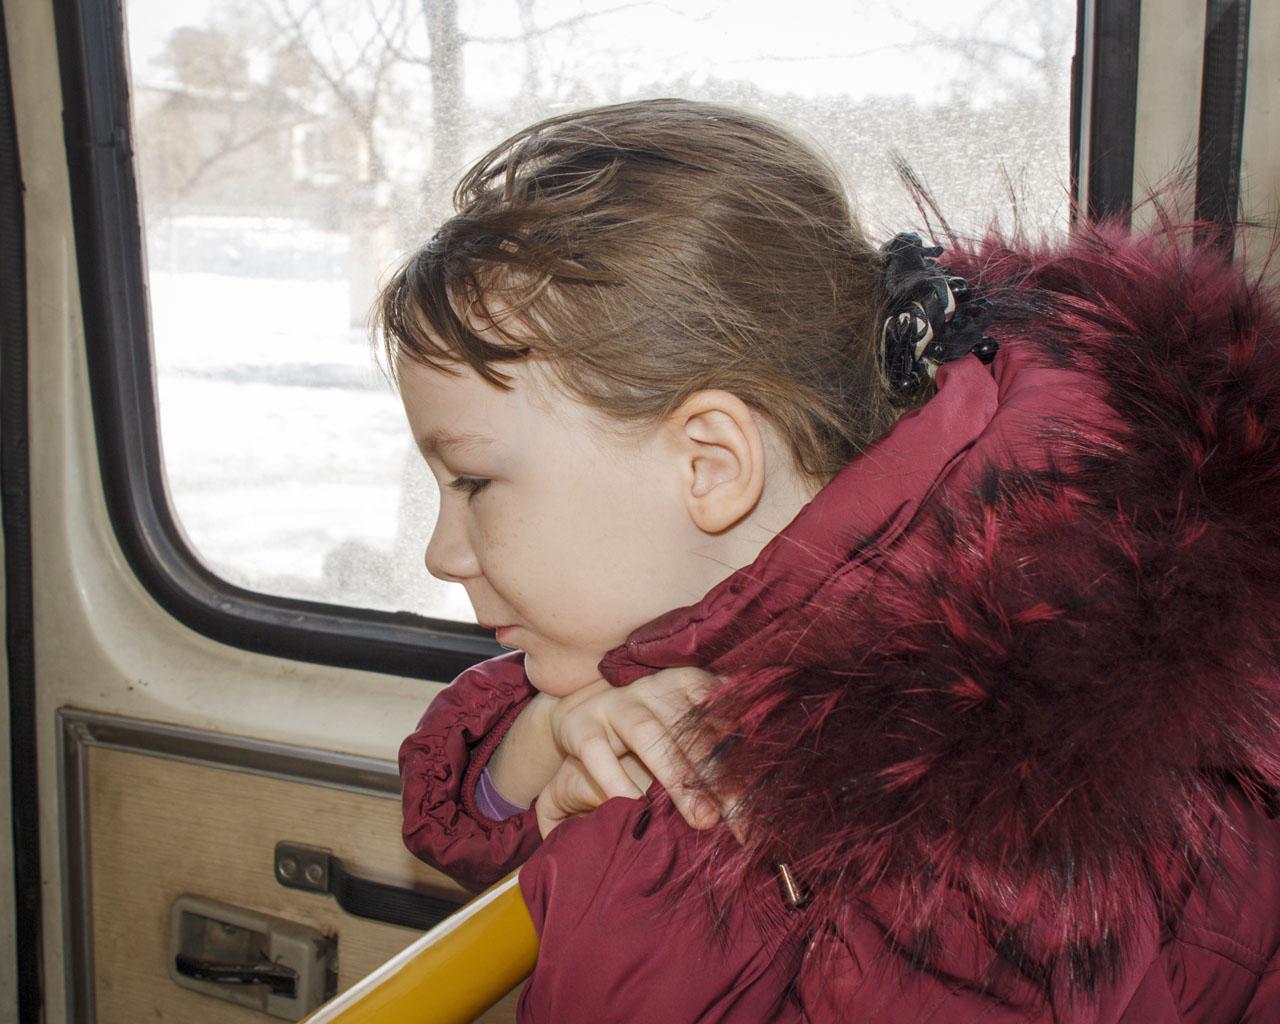 Фото члена в автобусе 12 фотография